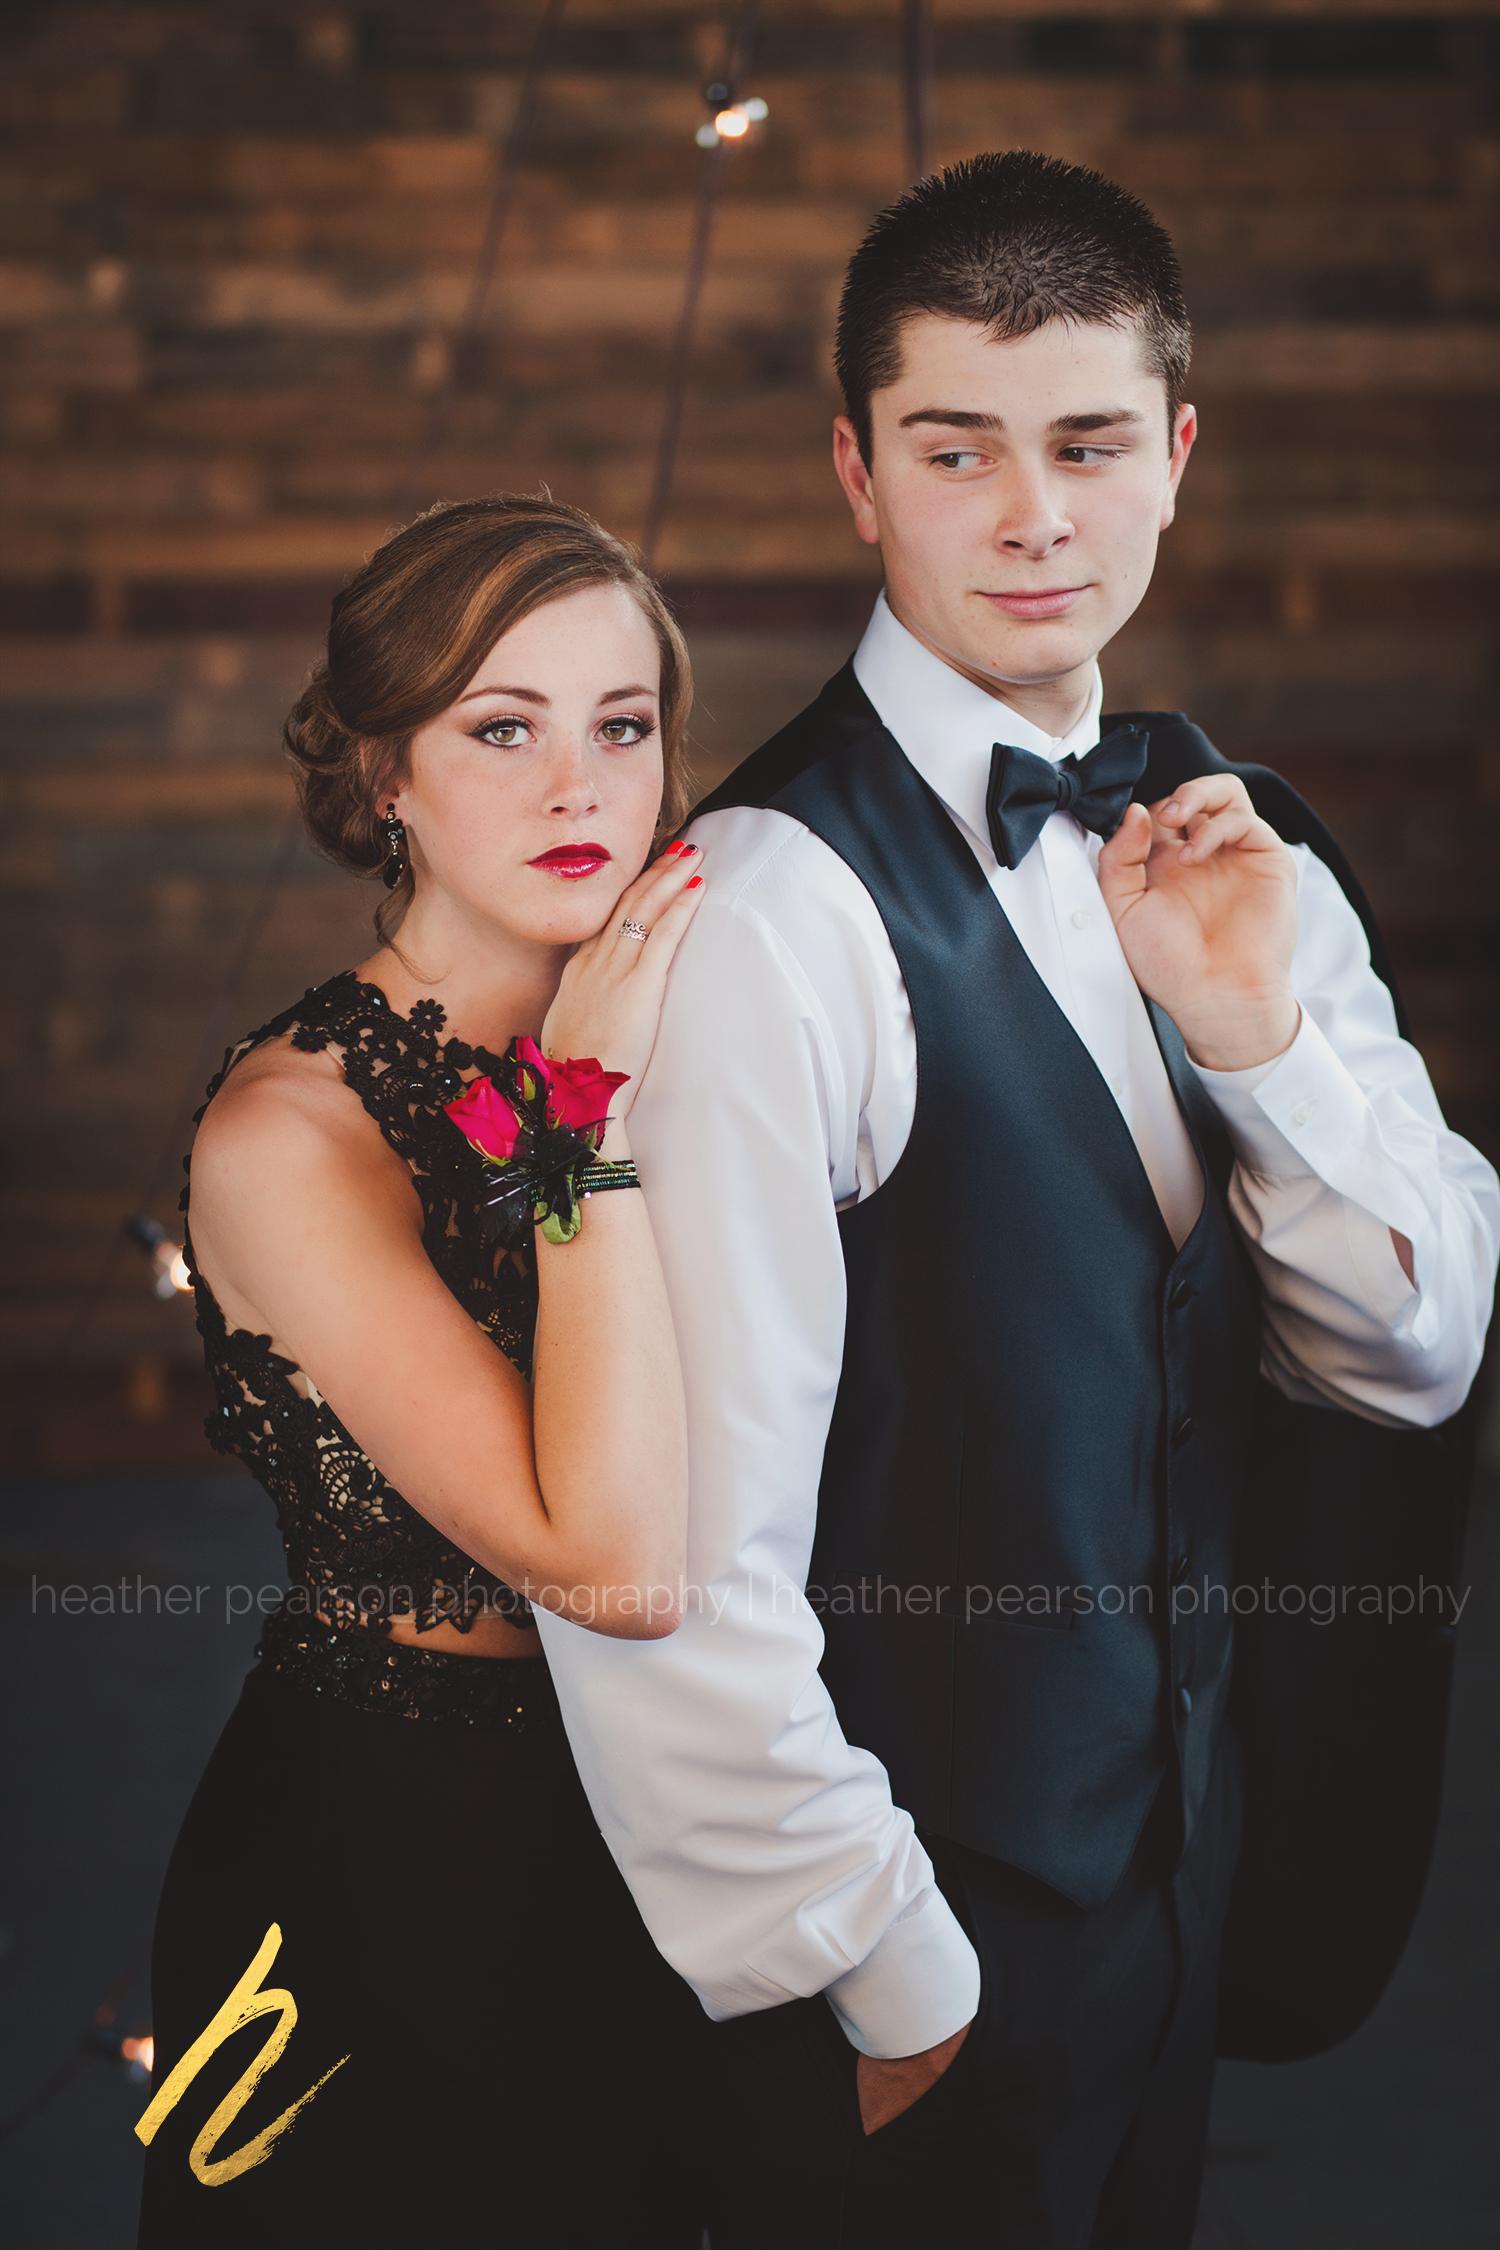 Heatherpearsonphotographycom, Heather Pearson Photography -8771